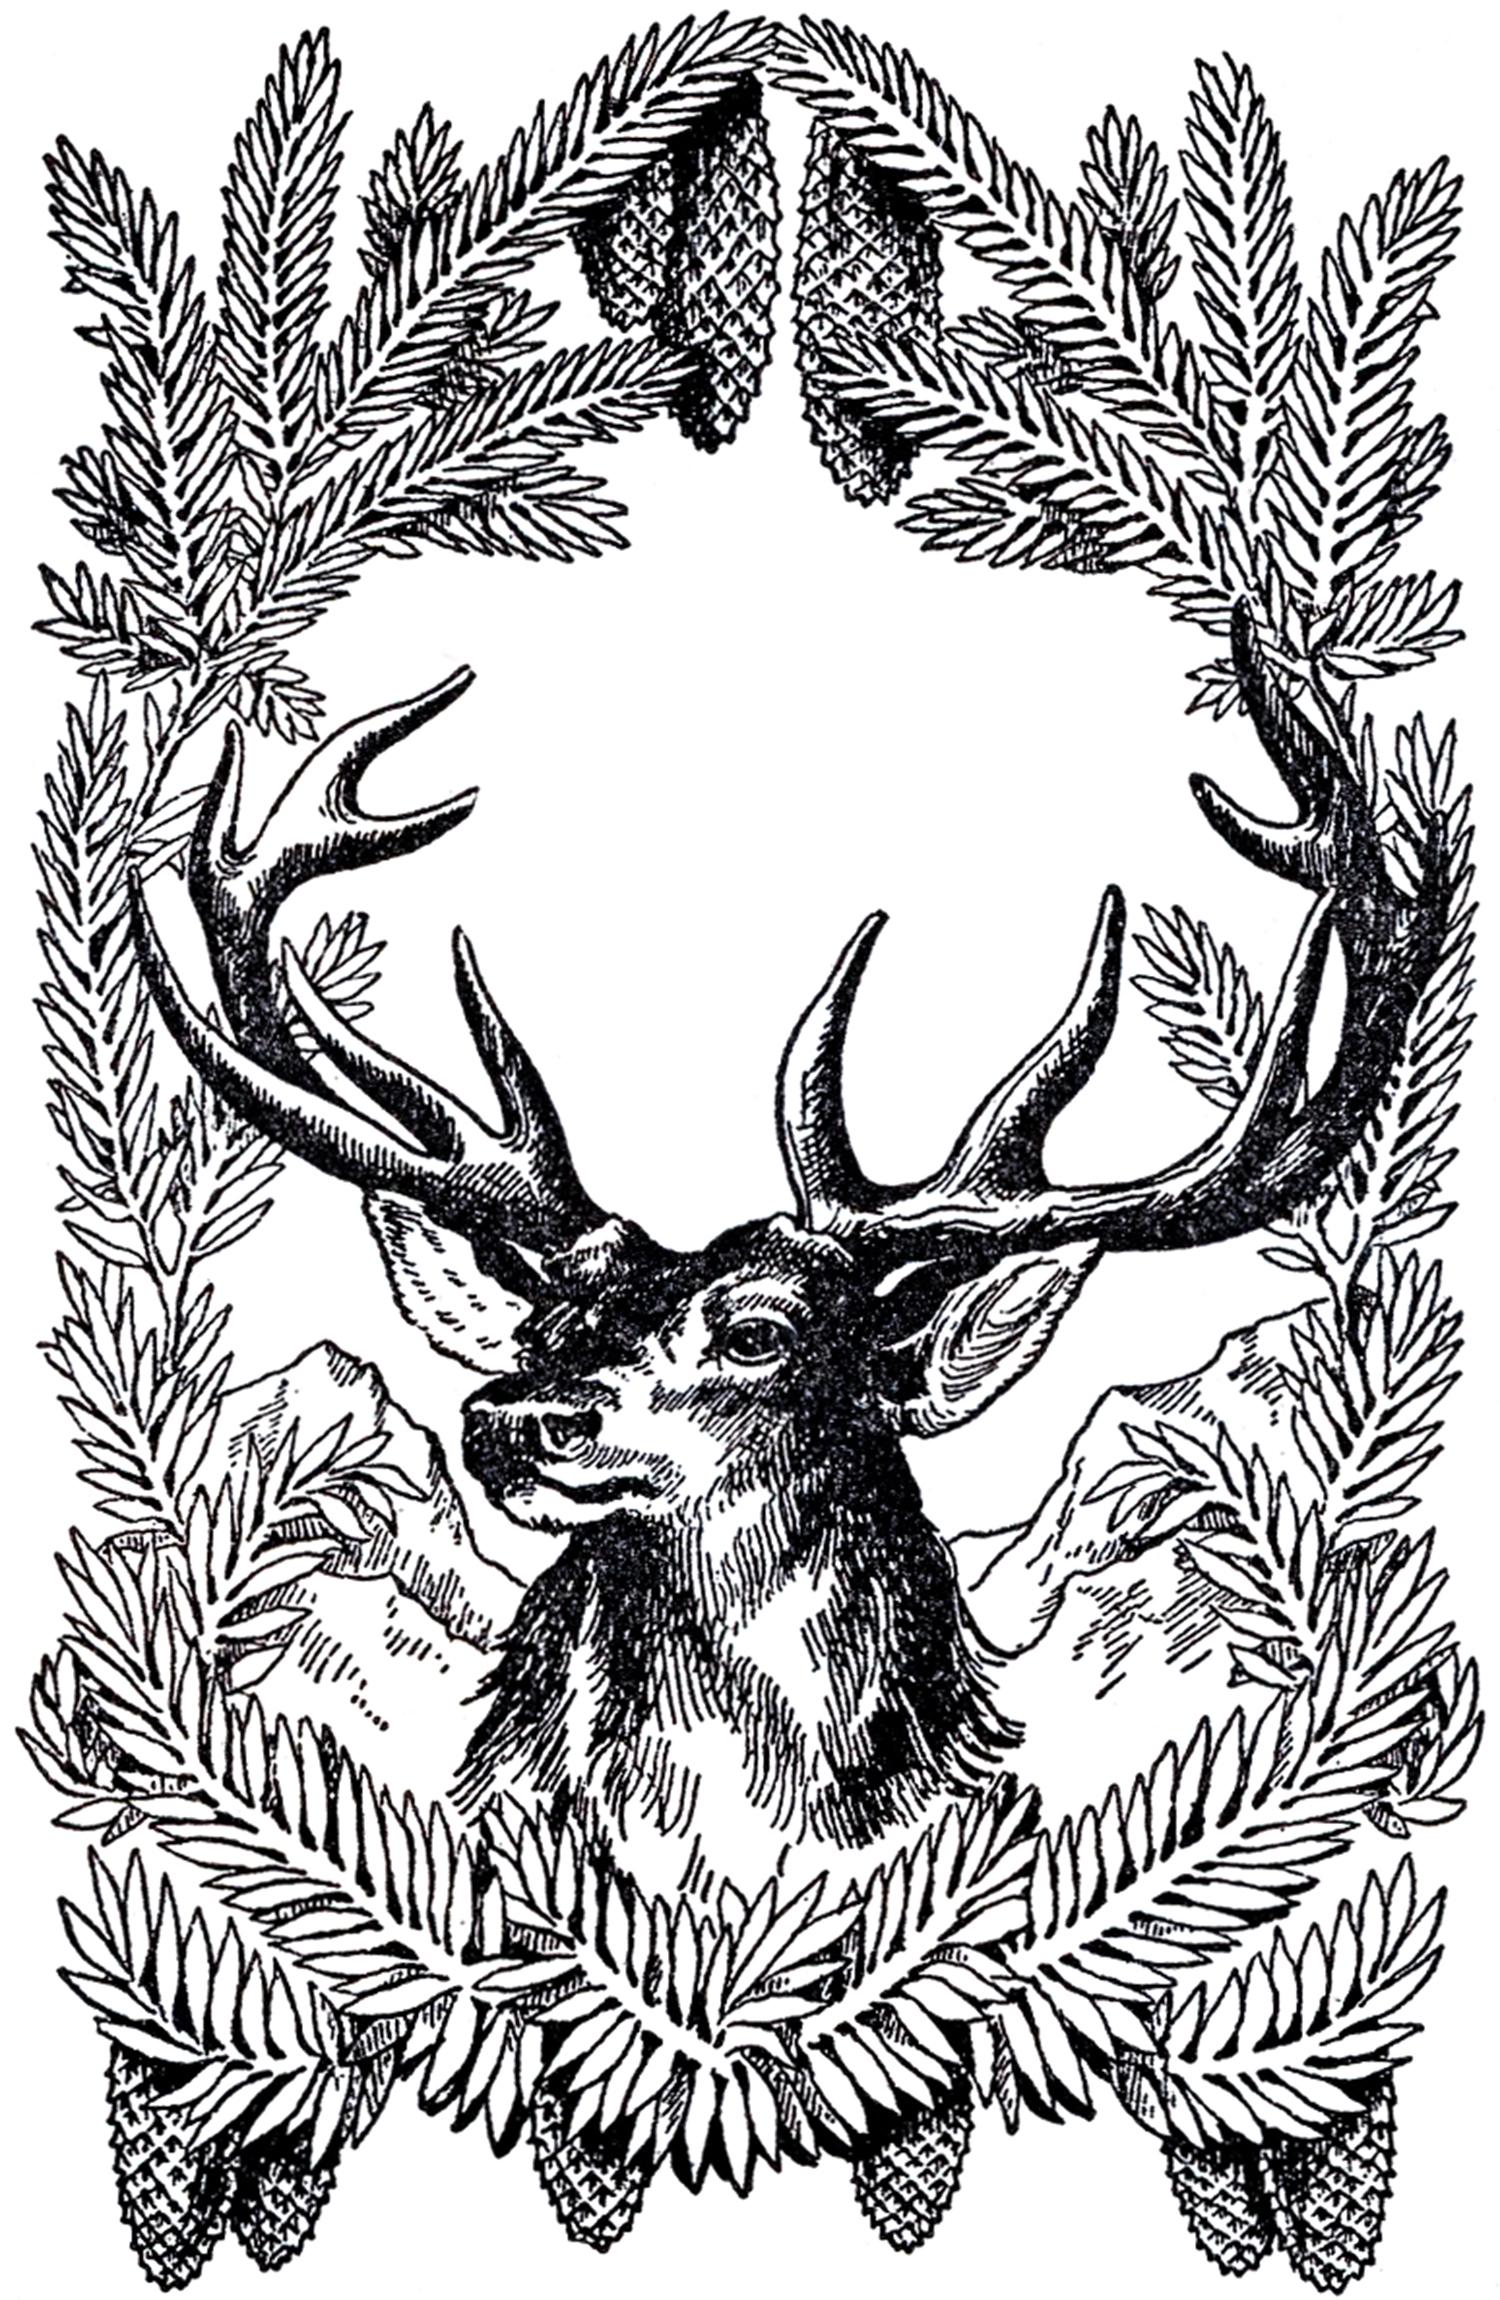 Public domain artwork free clip art royalty free stock public domain graphic design – Clipart Free Download clip art royalty free stock